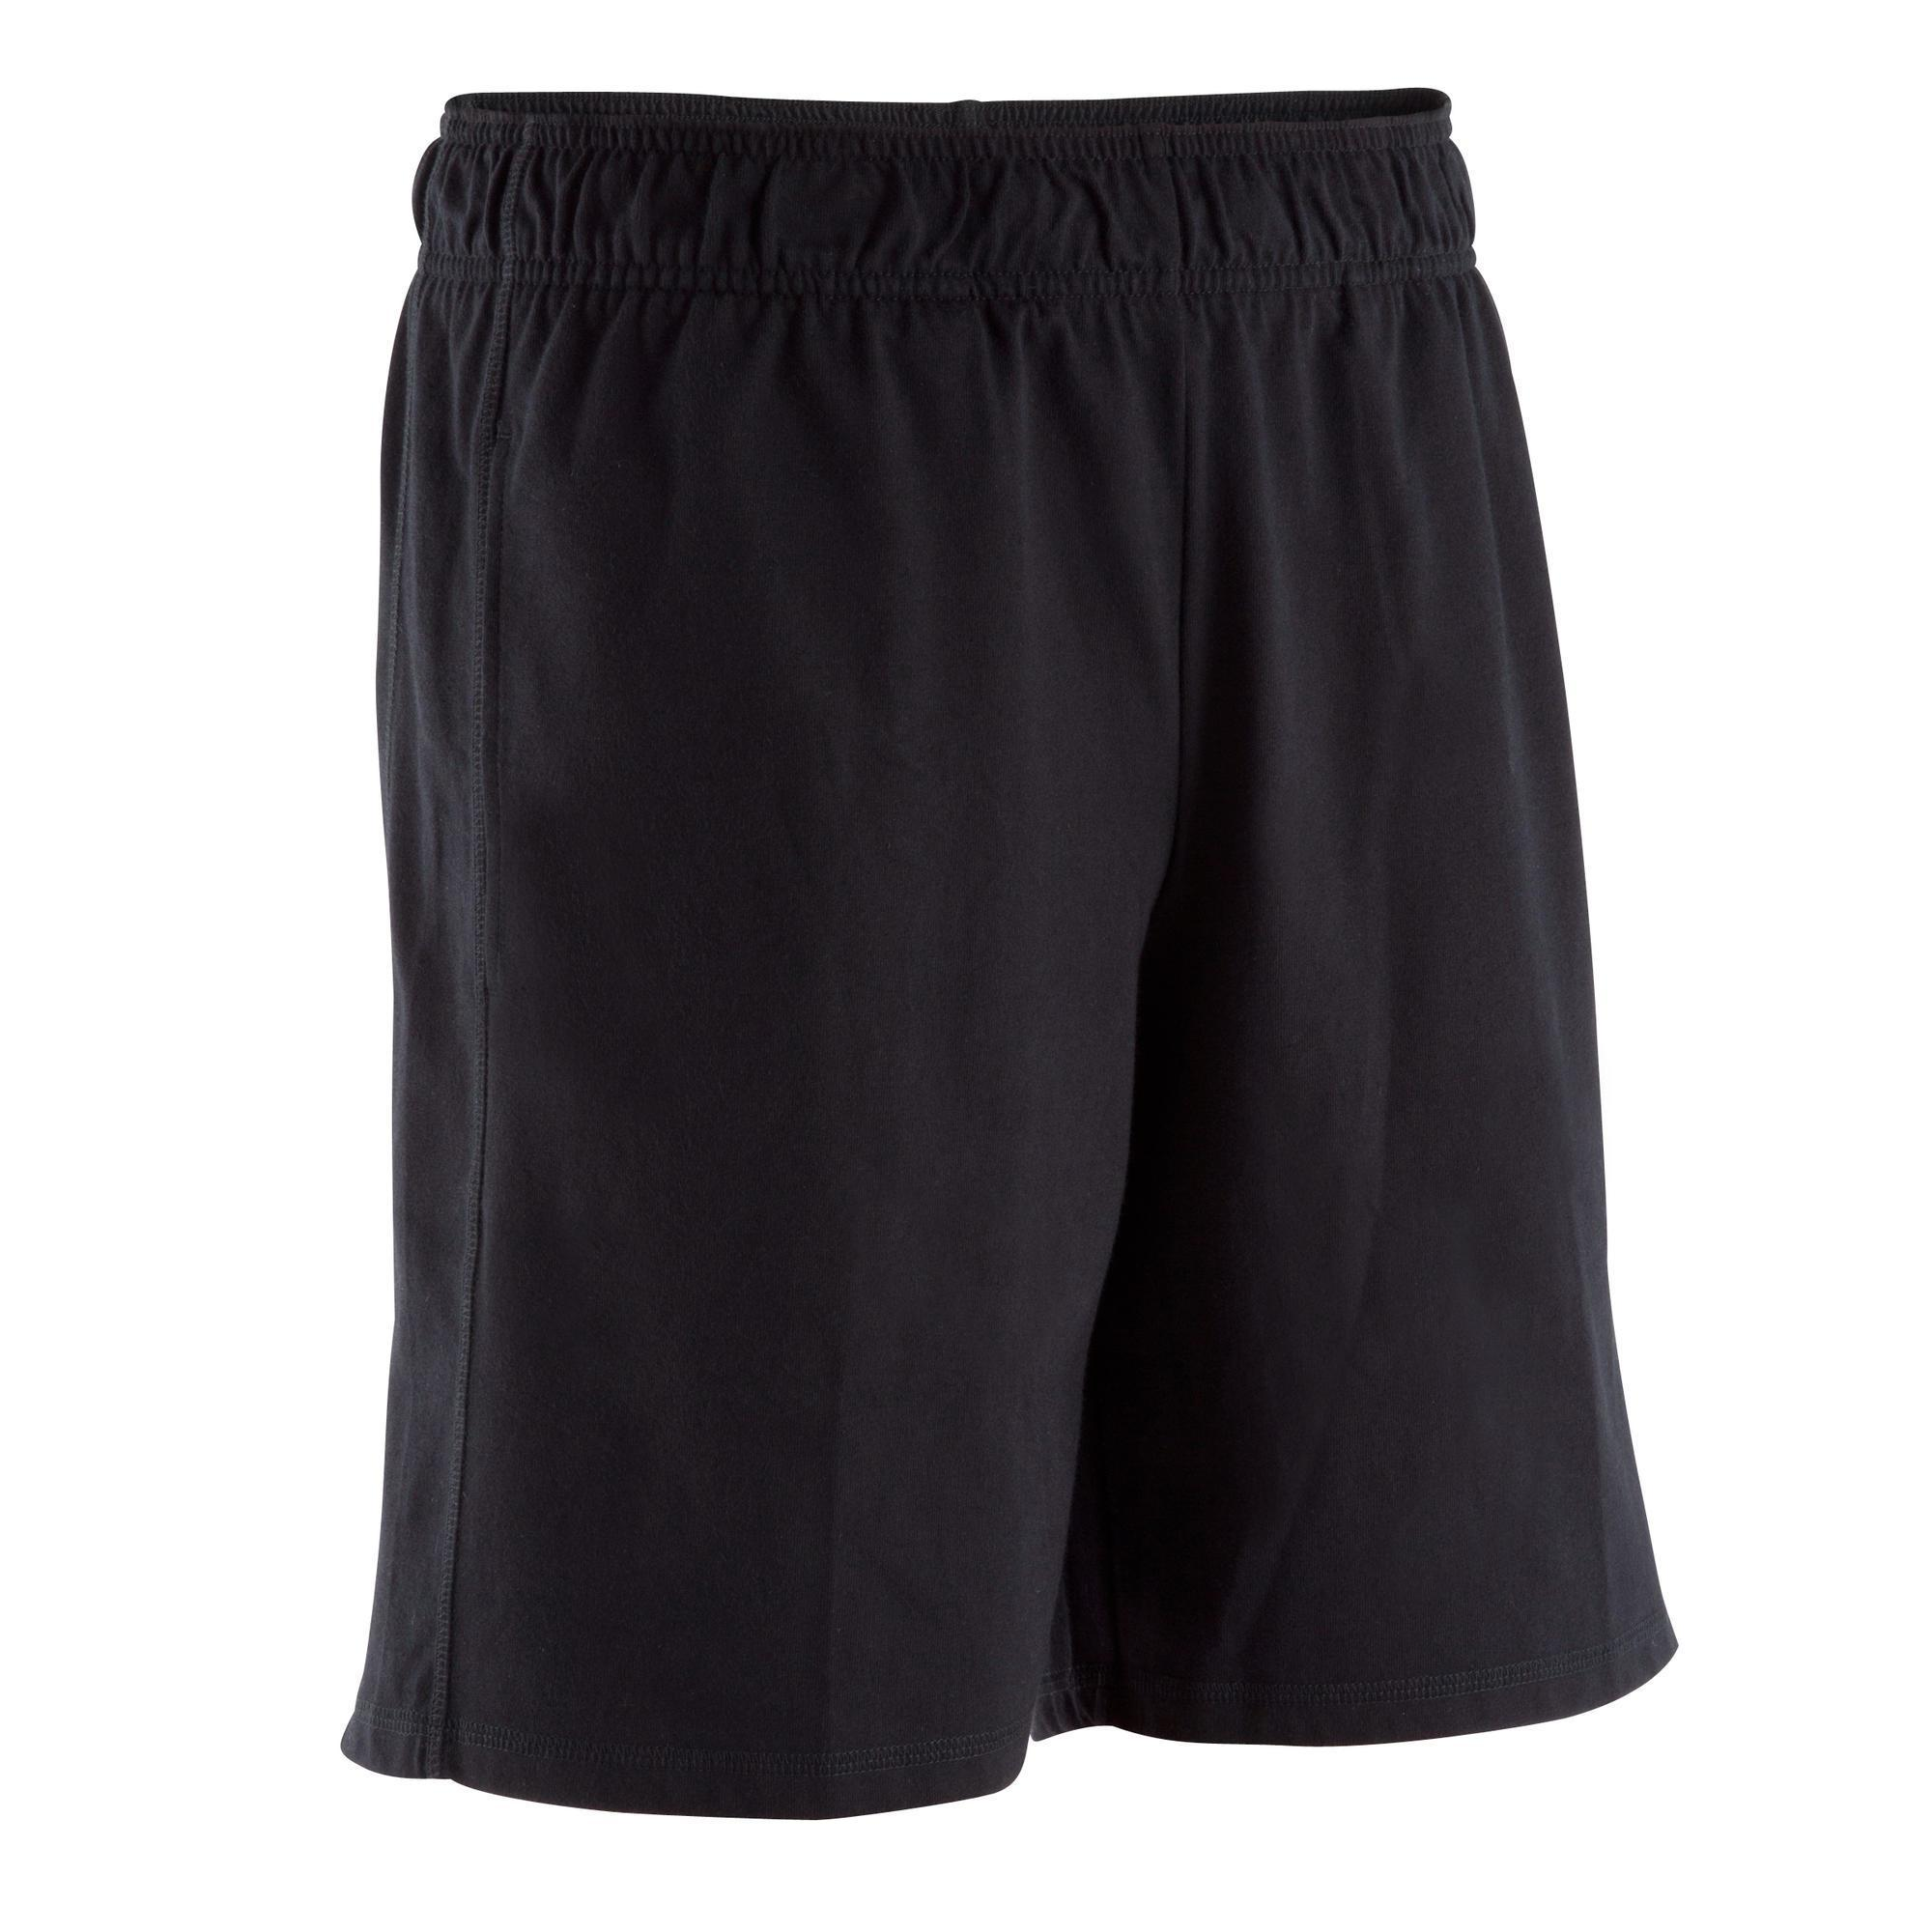 Active Fitness Shorts - Black